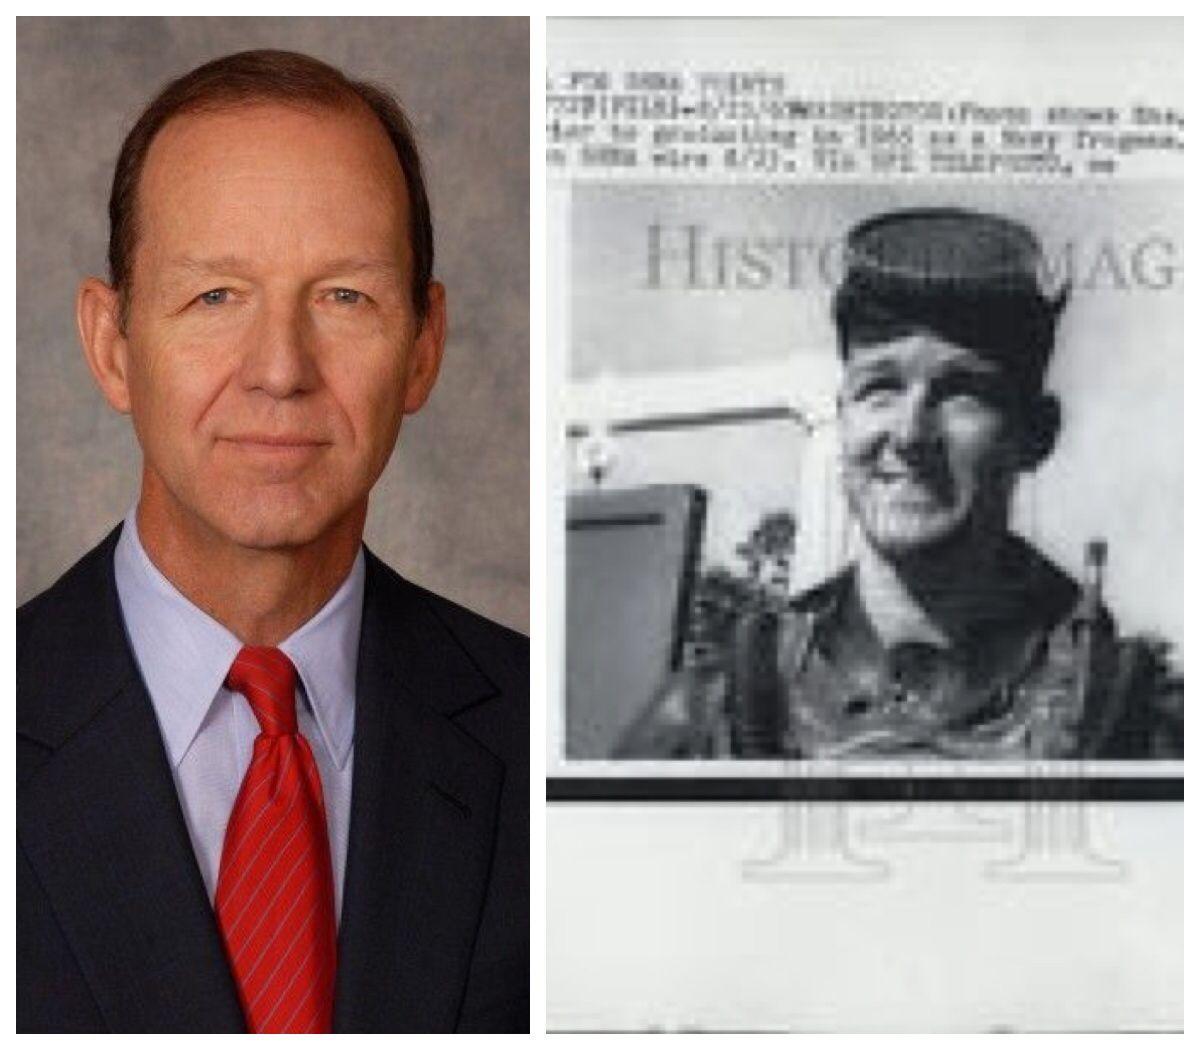 John Sidney Mccain Iv: Theodore Roosevelt IV-Navy-1965-underwater Demolition Team